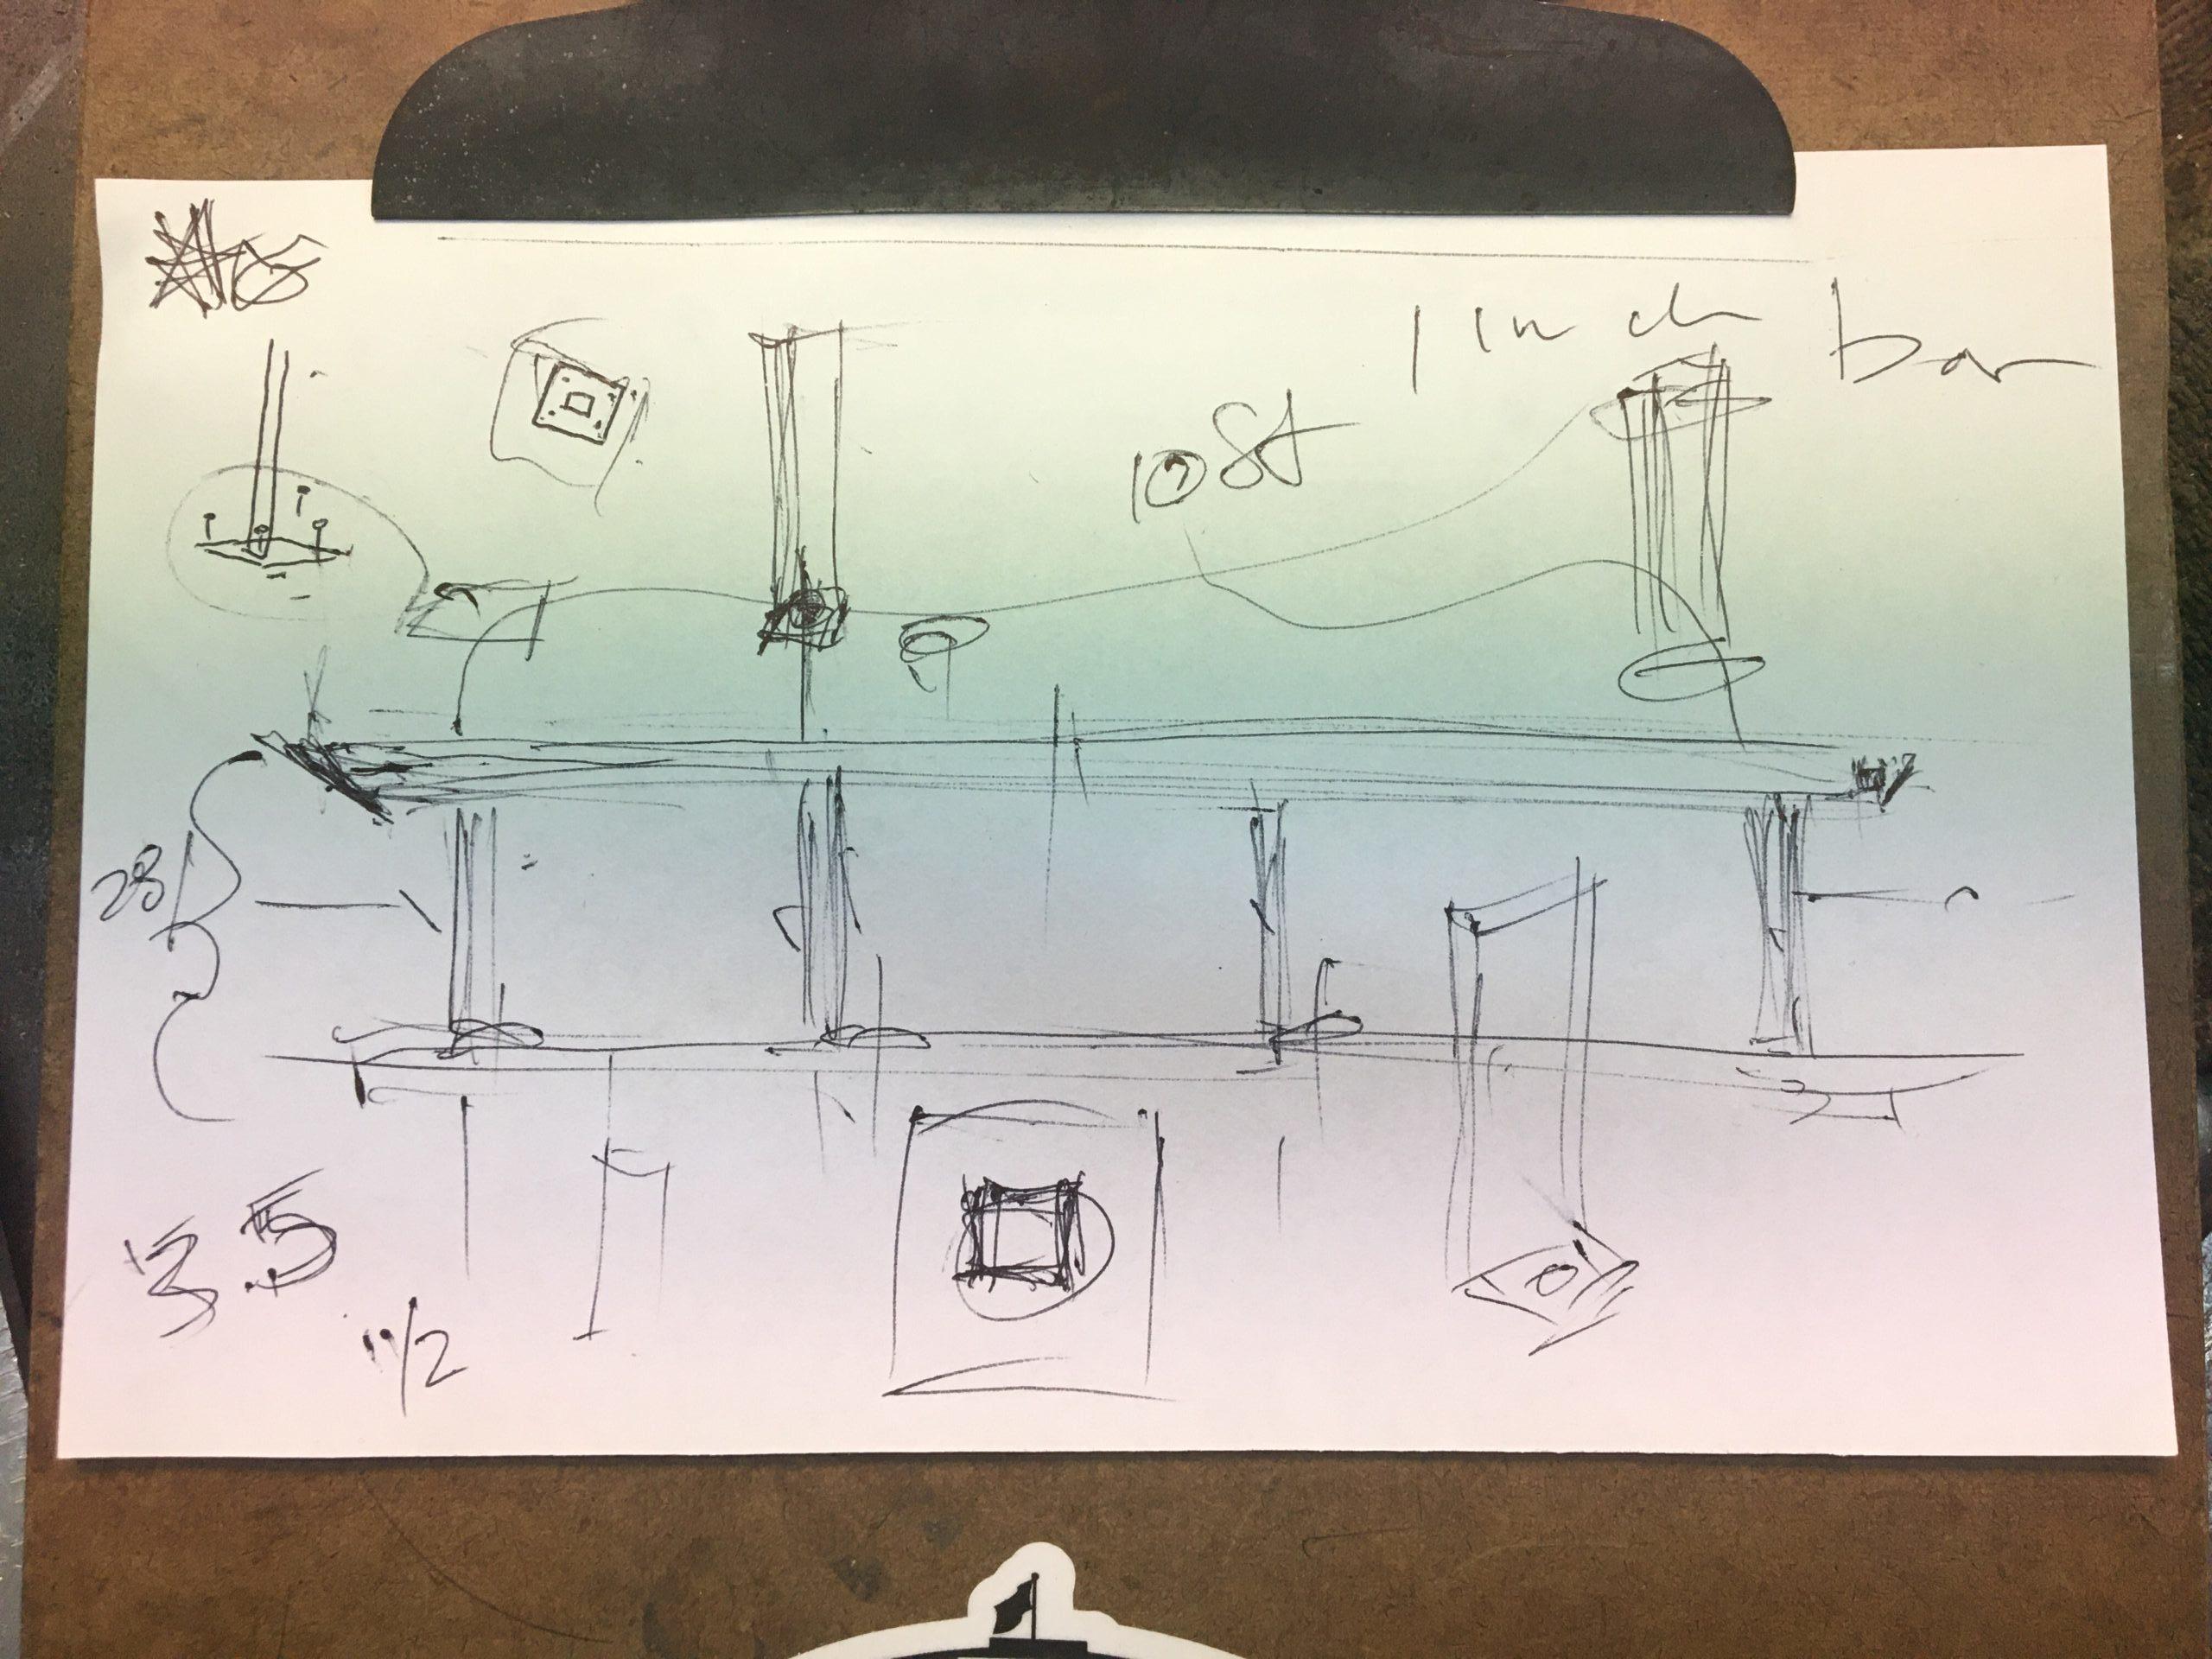 Rough Design Sketch